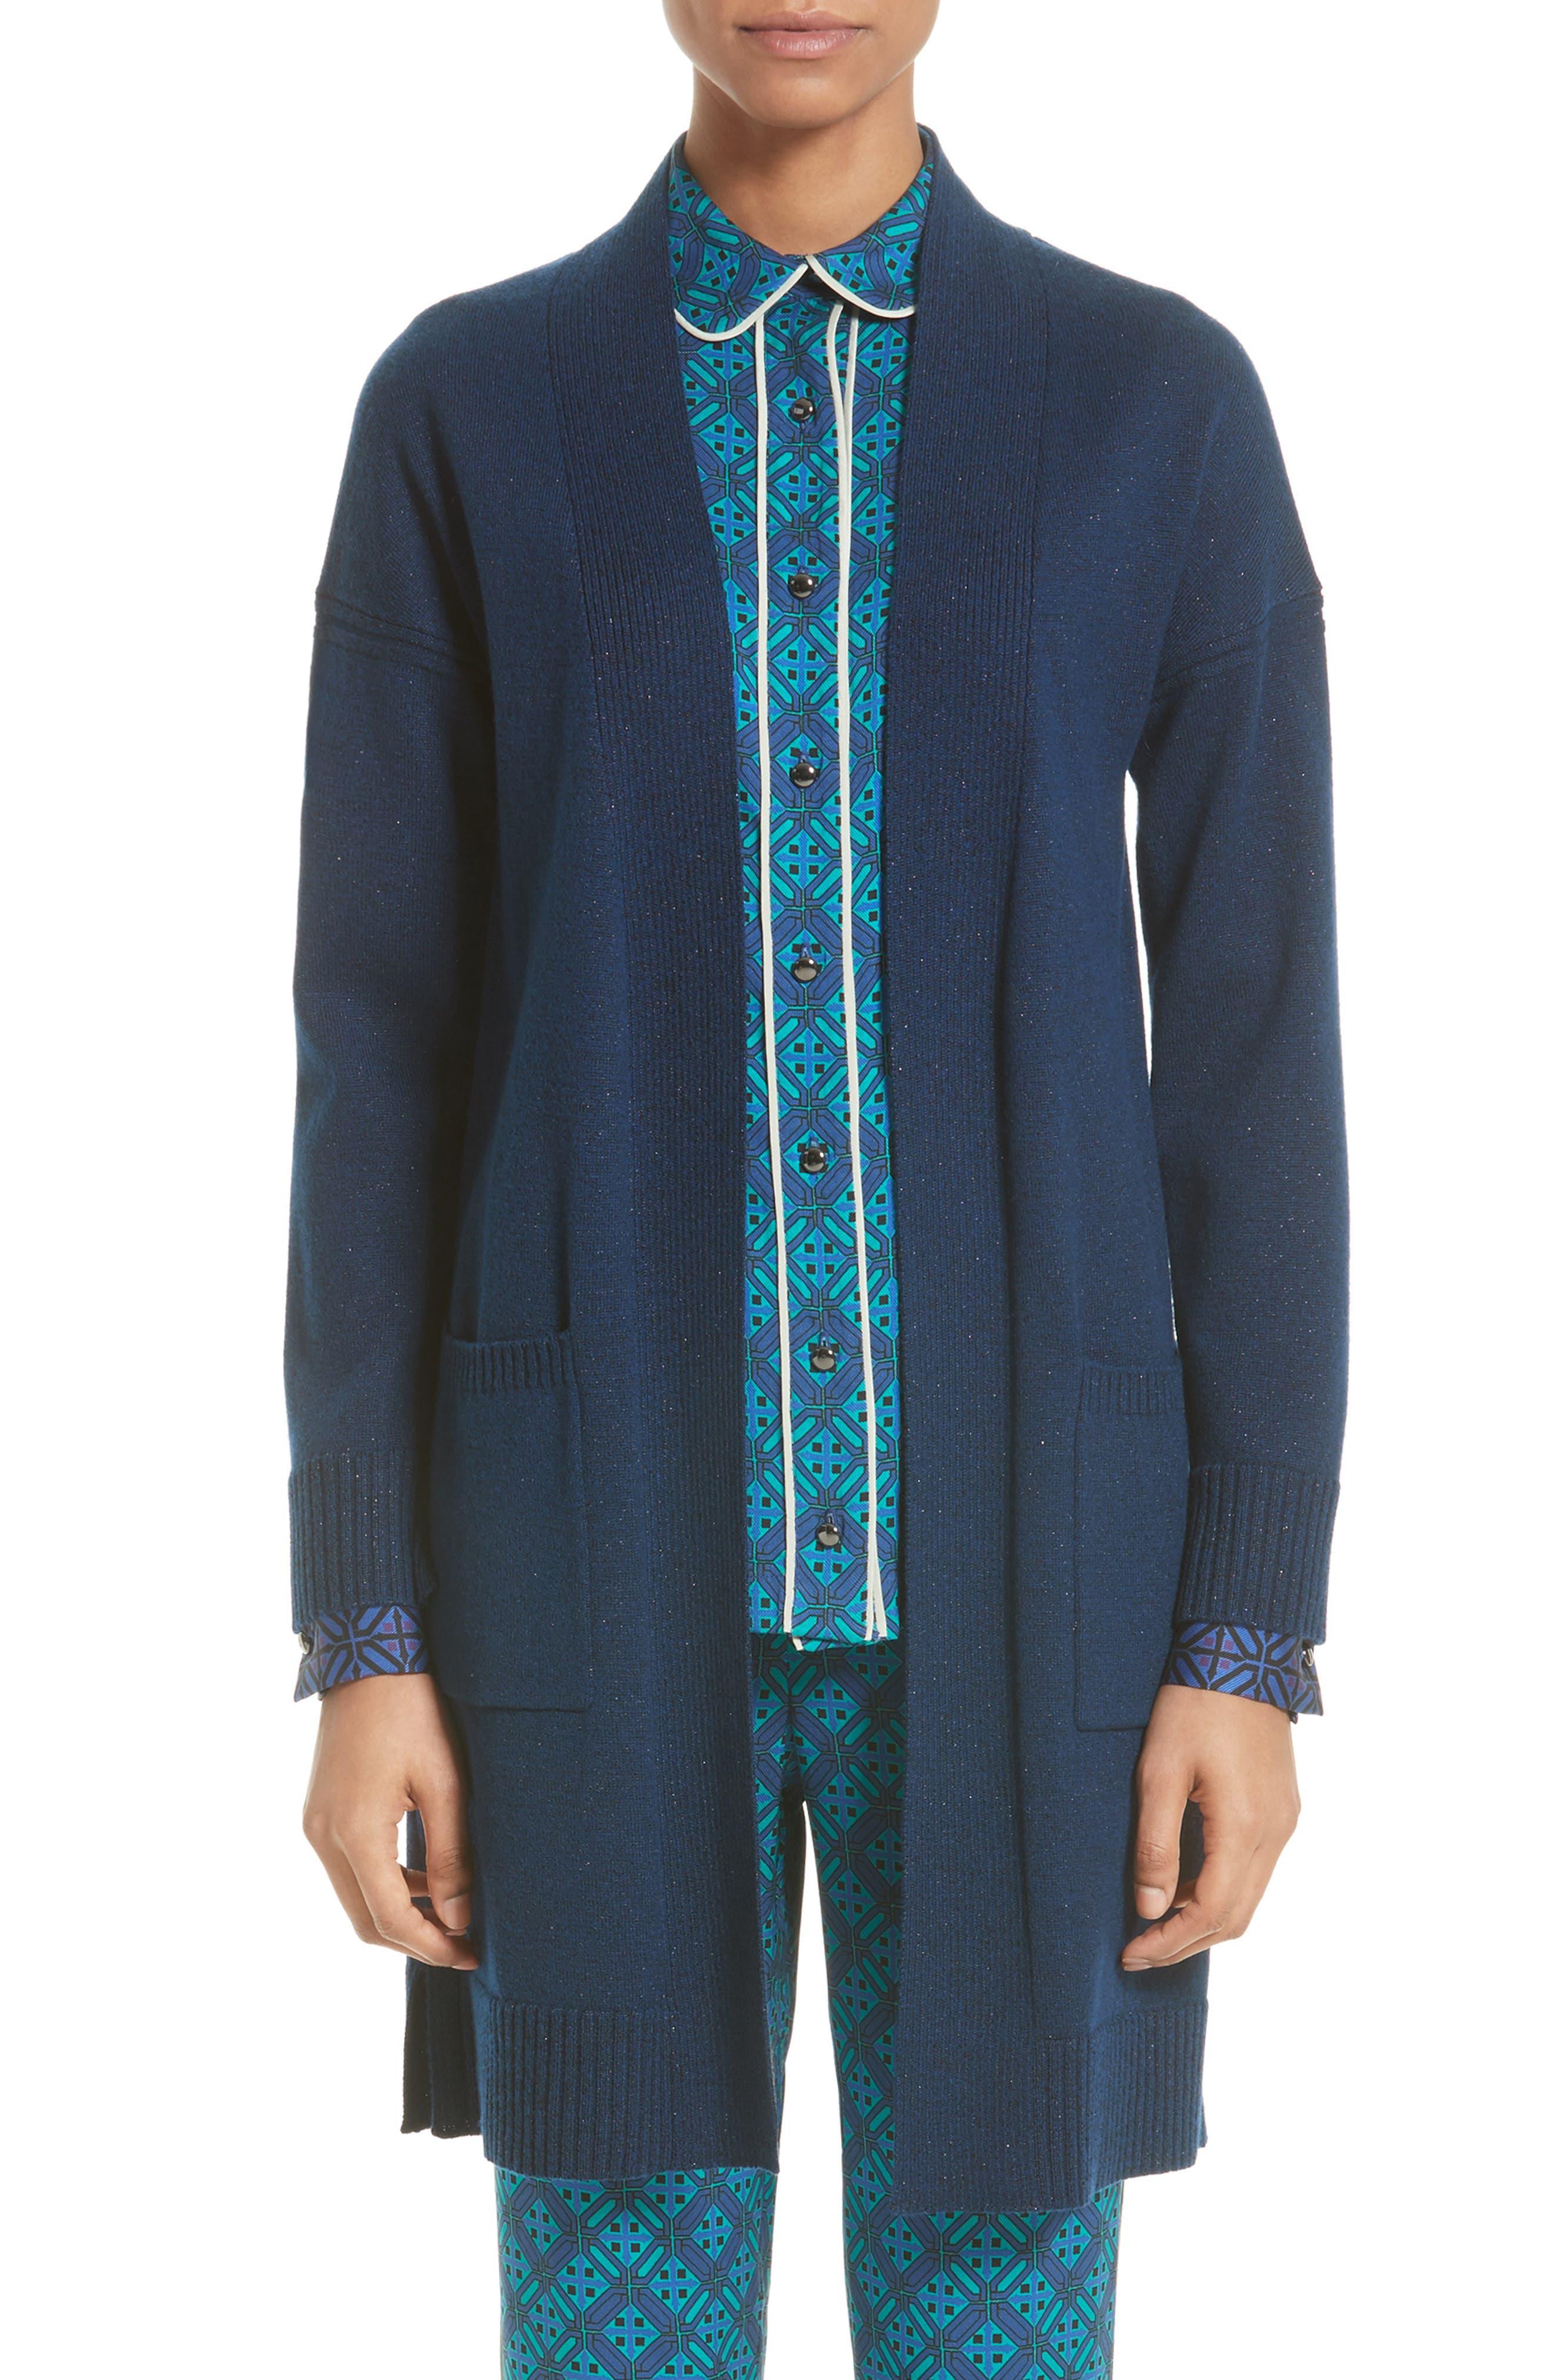 Jersey Cashmere Blend Sparkle Knit Jacket,                         Main,                         color, 410